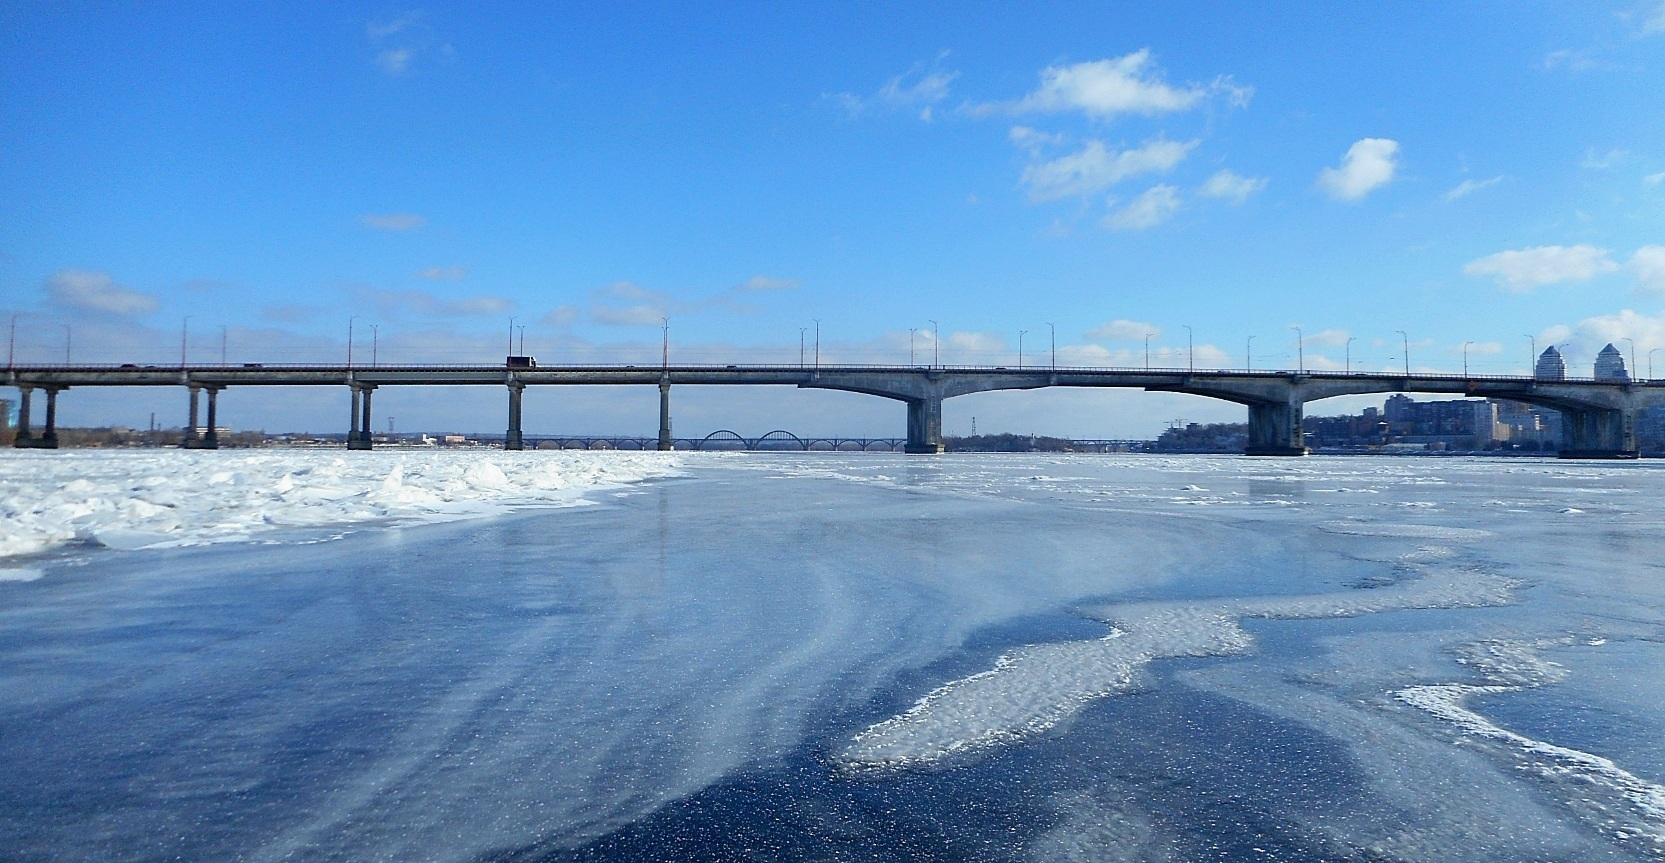 На середине Днепра. Новый мост